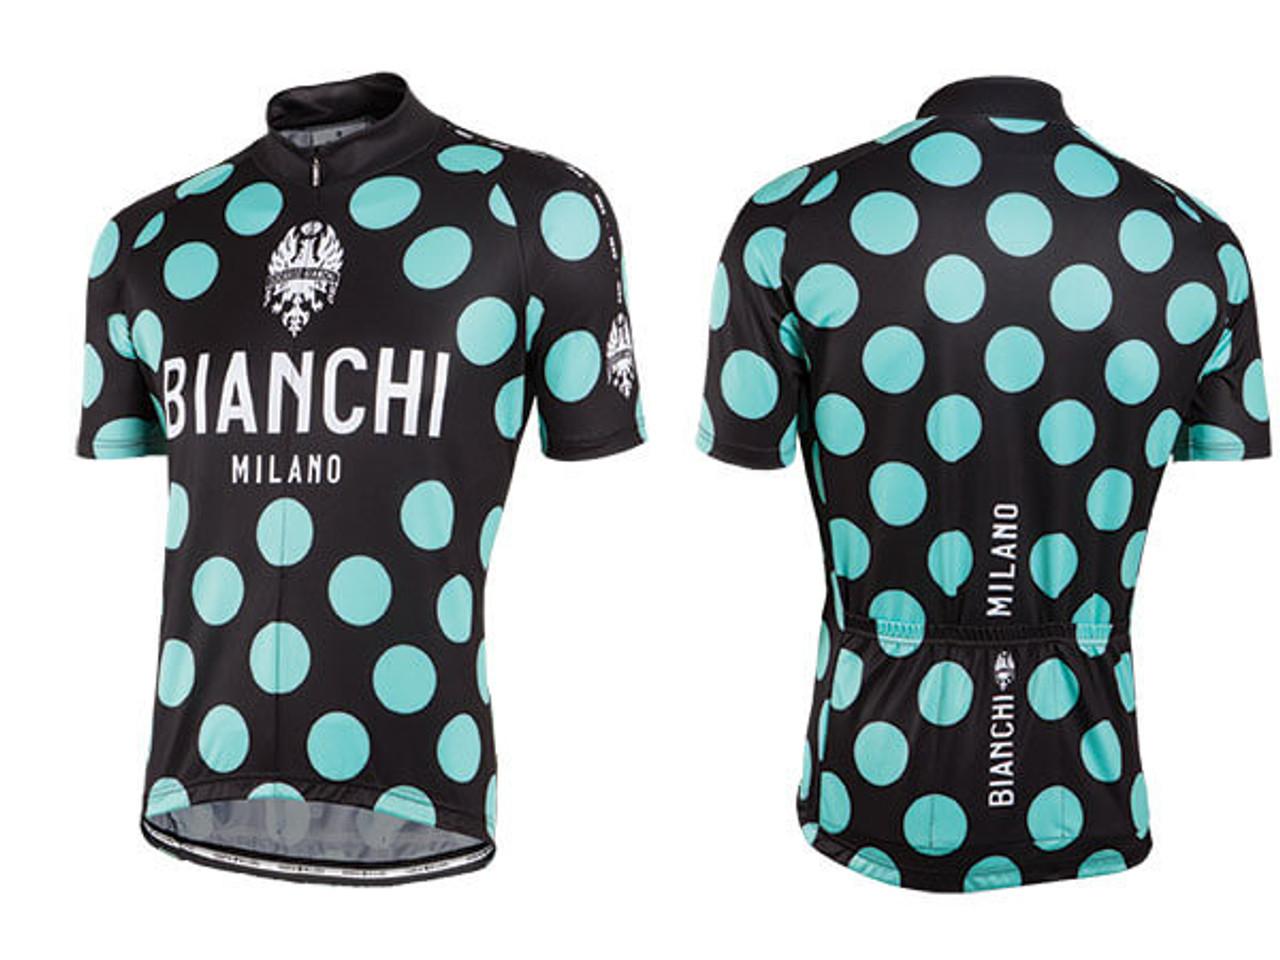 Nalini Bianchi Bianchi Pride Maillot /à Manches Courtes Homme